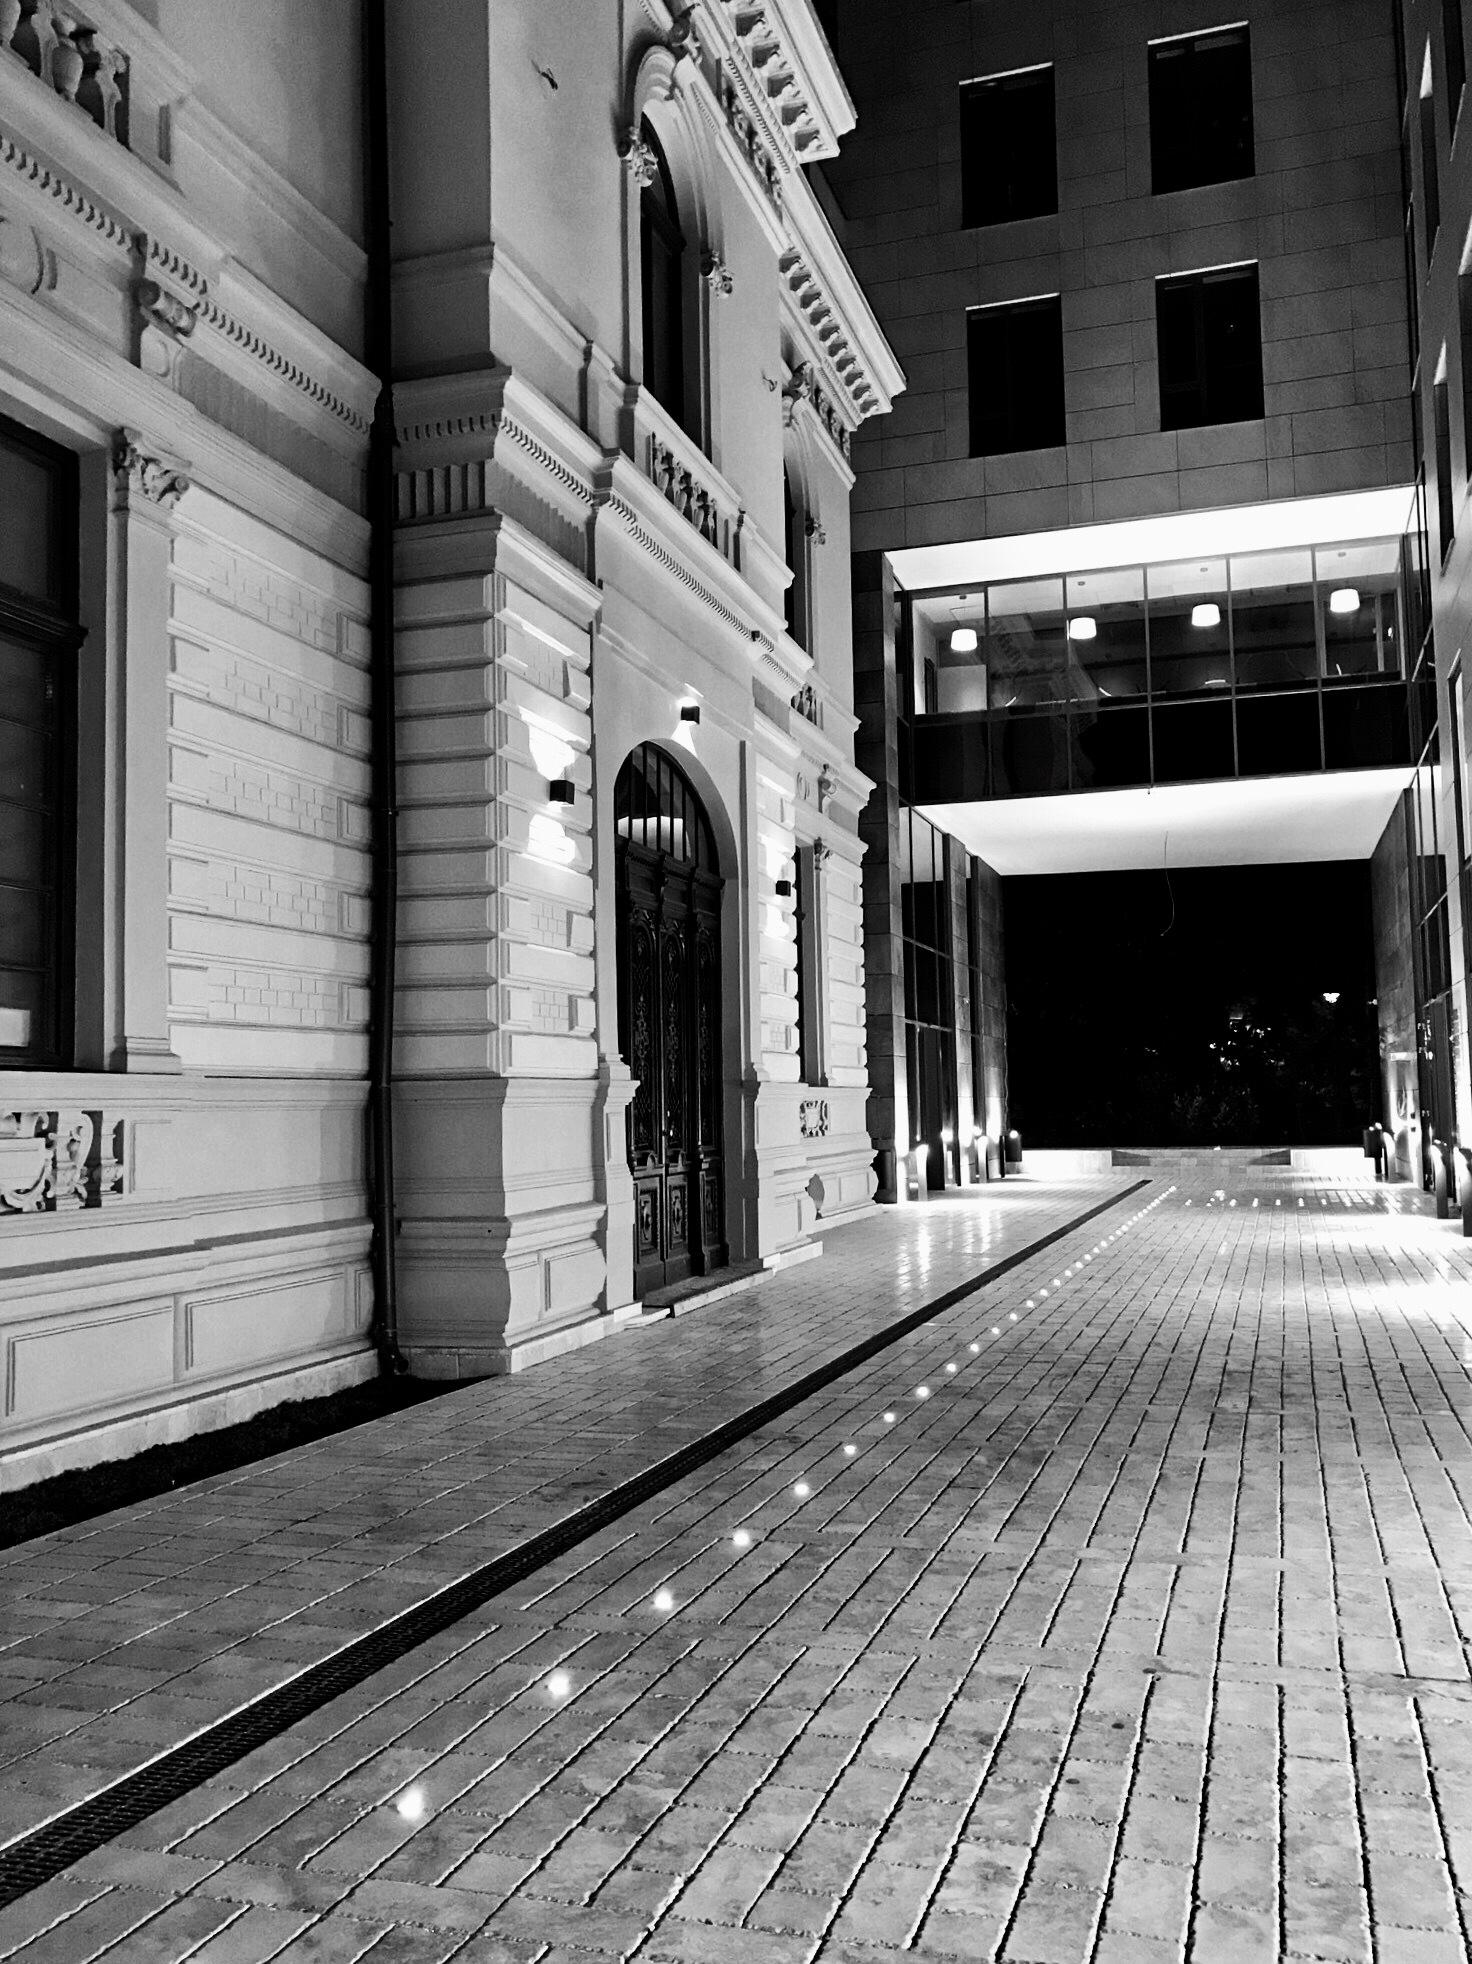 Old and new architecture in B&W by Adi Gli